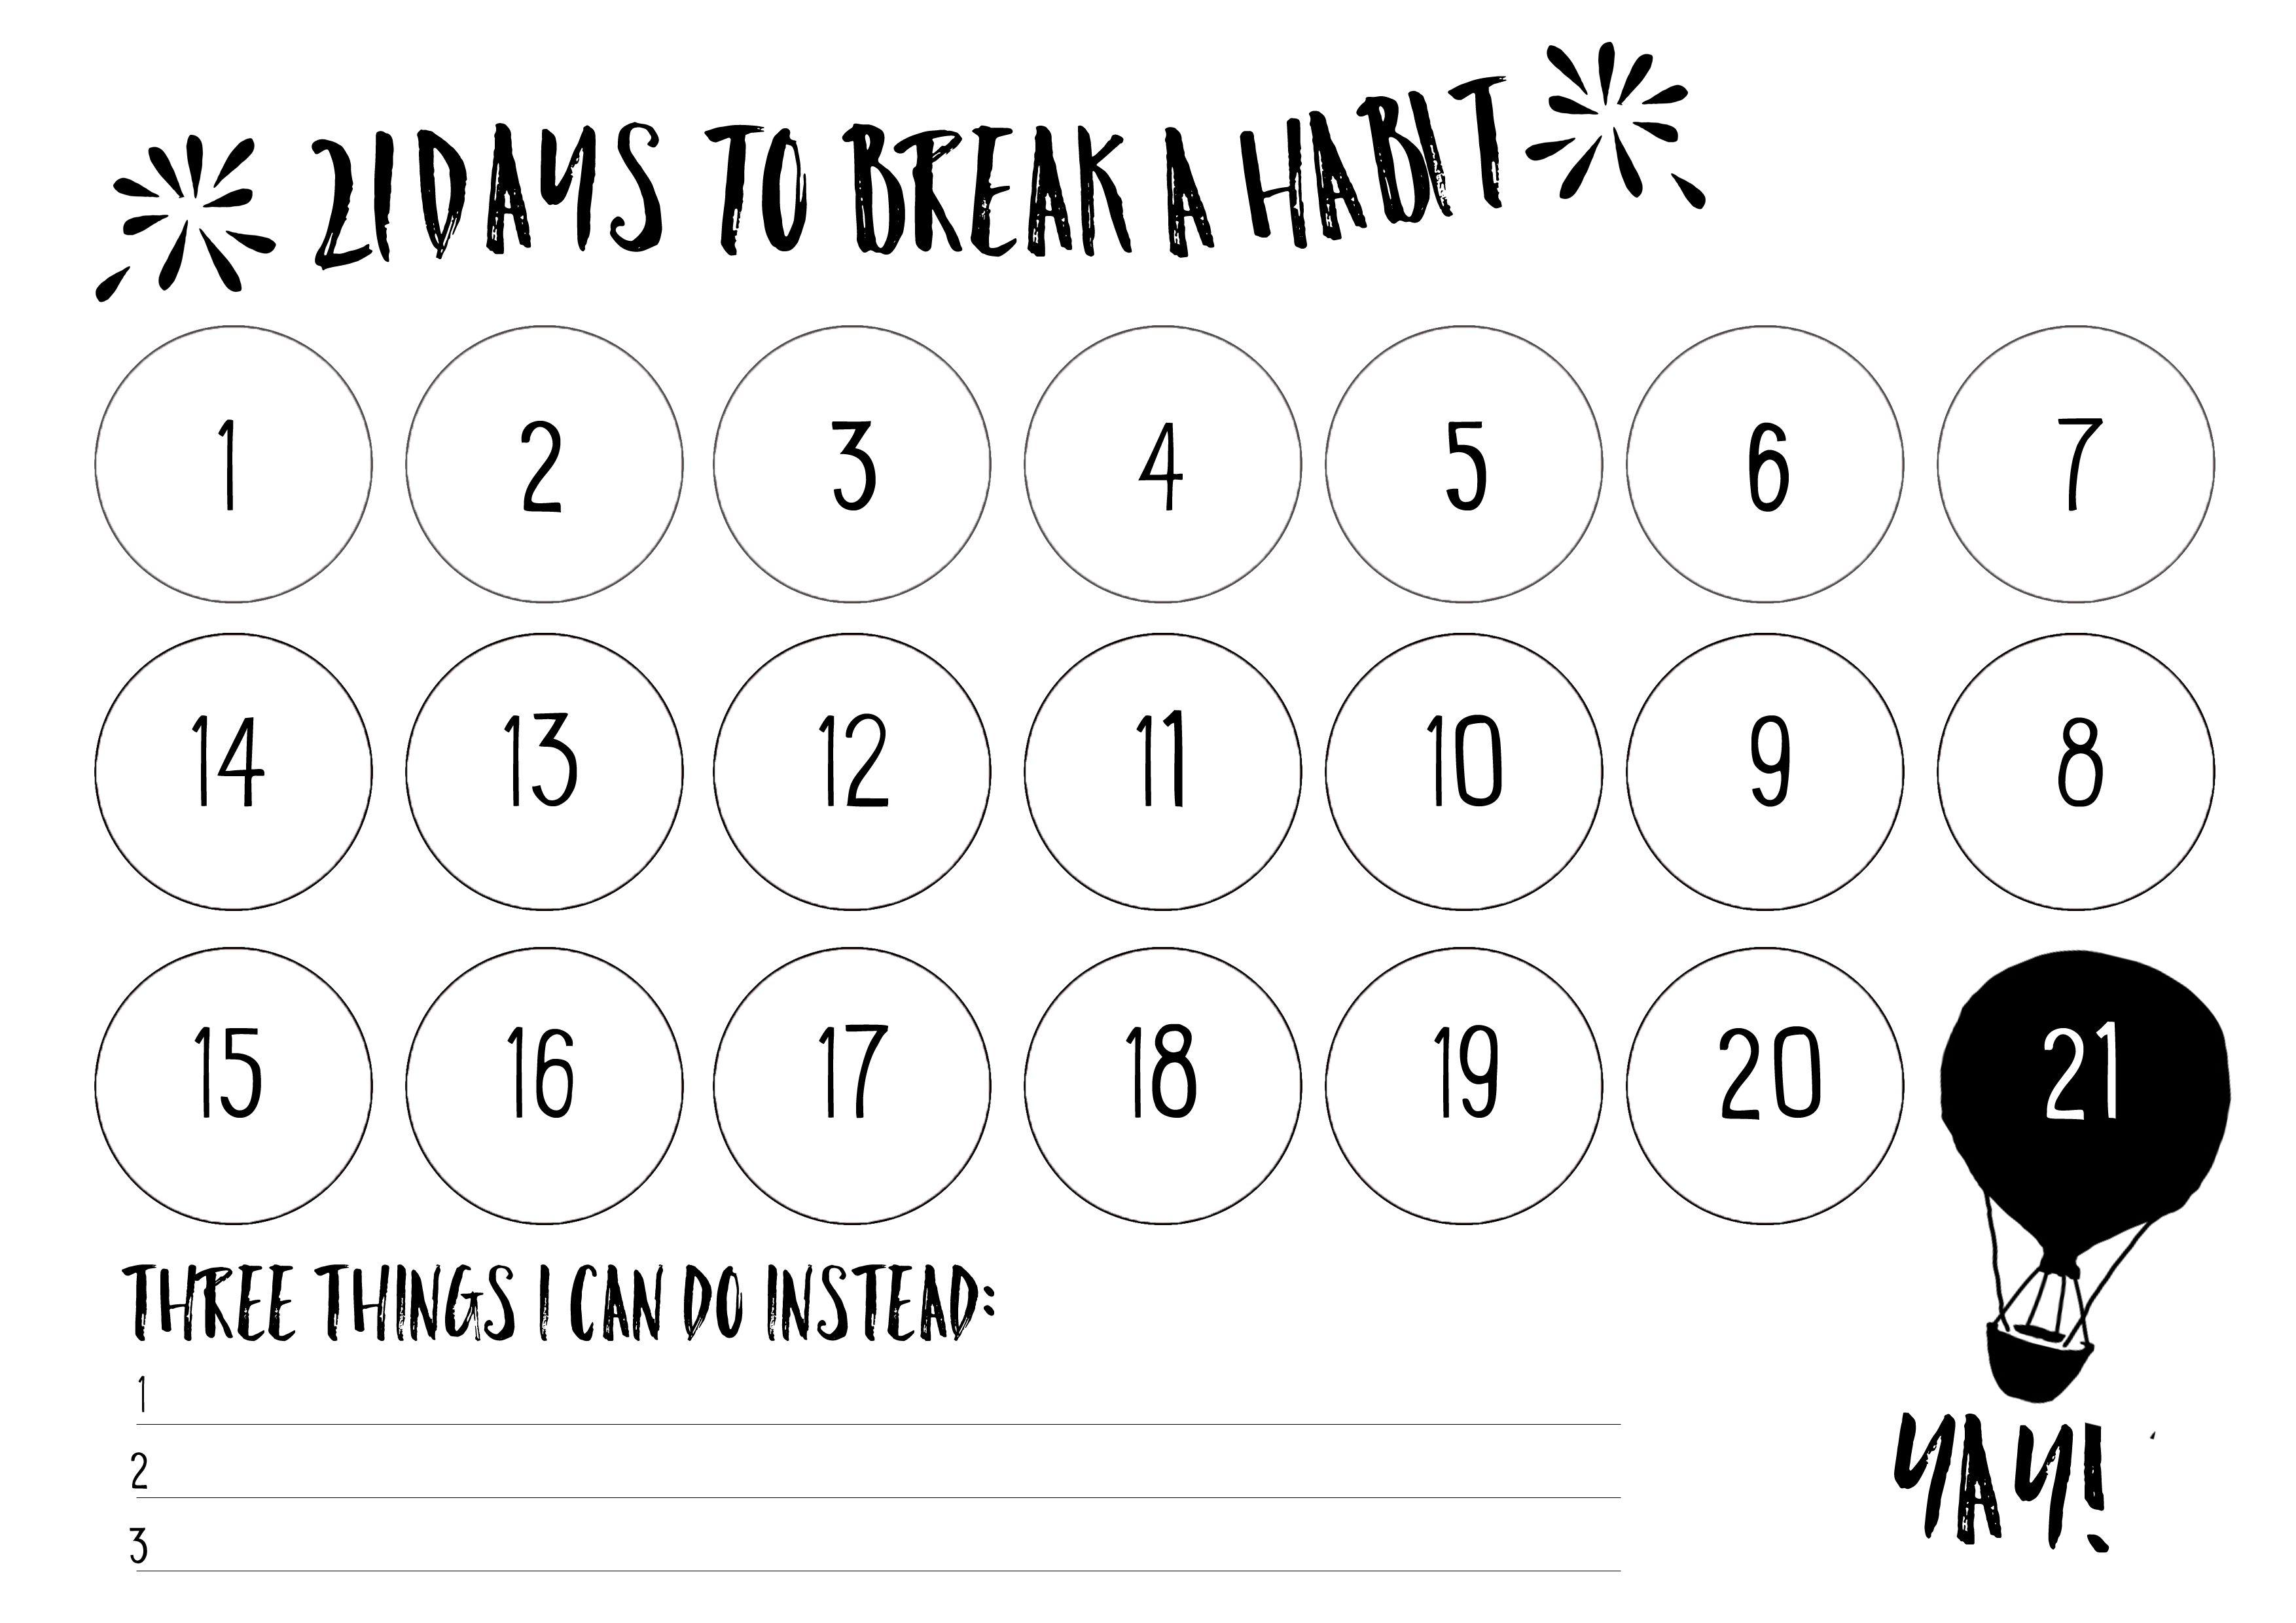 21 days to break a habit Break a habit, 21 days habit